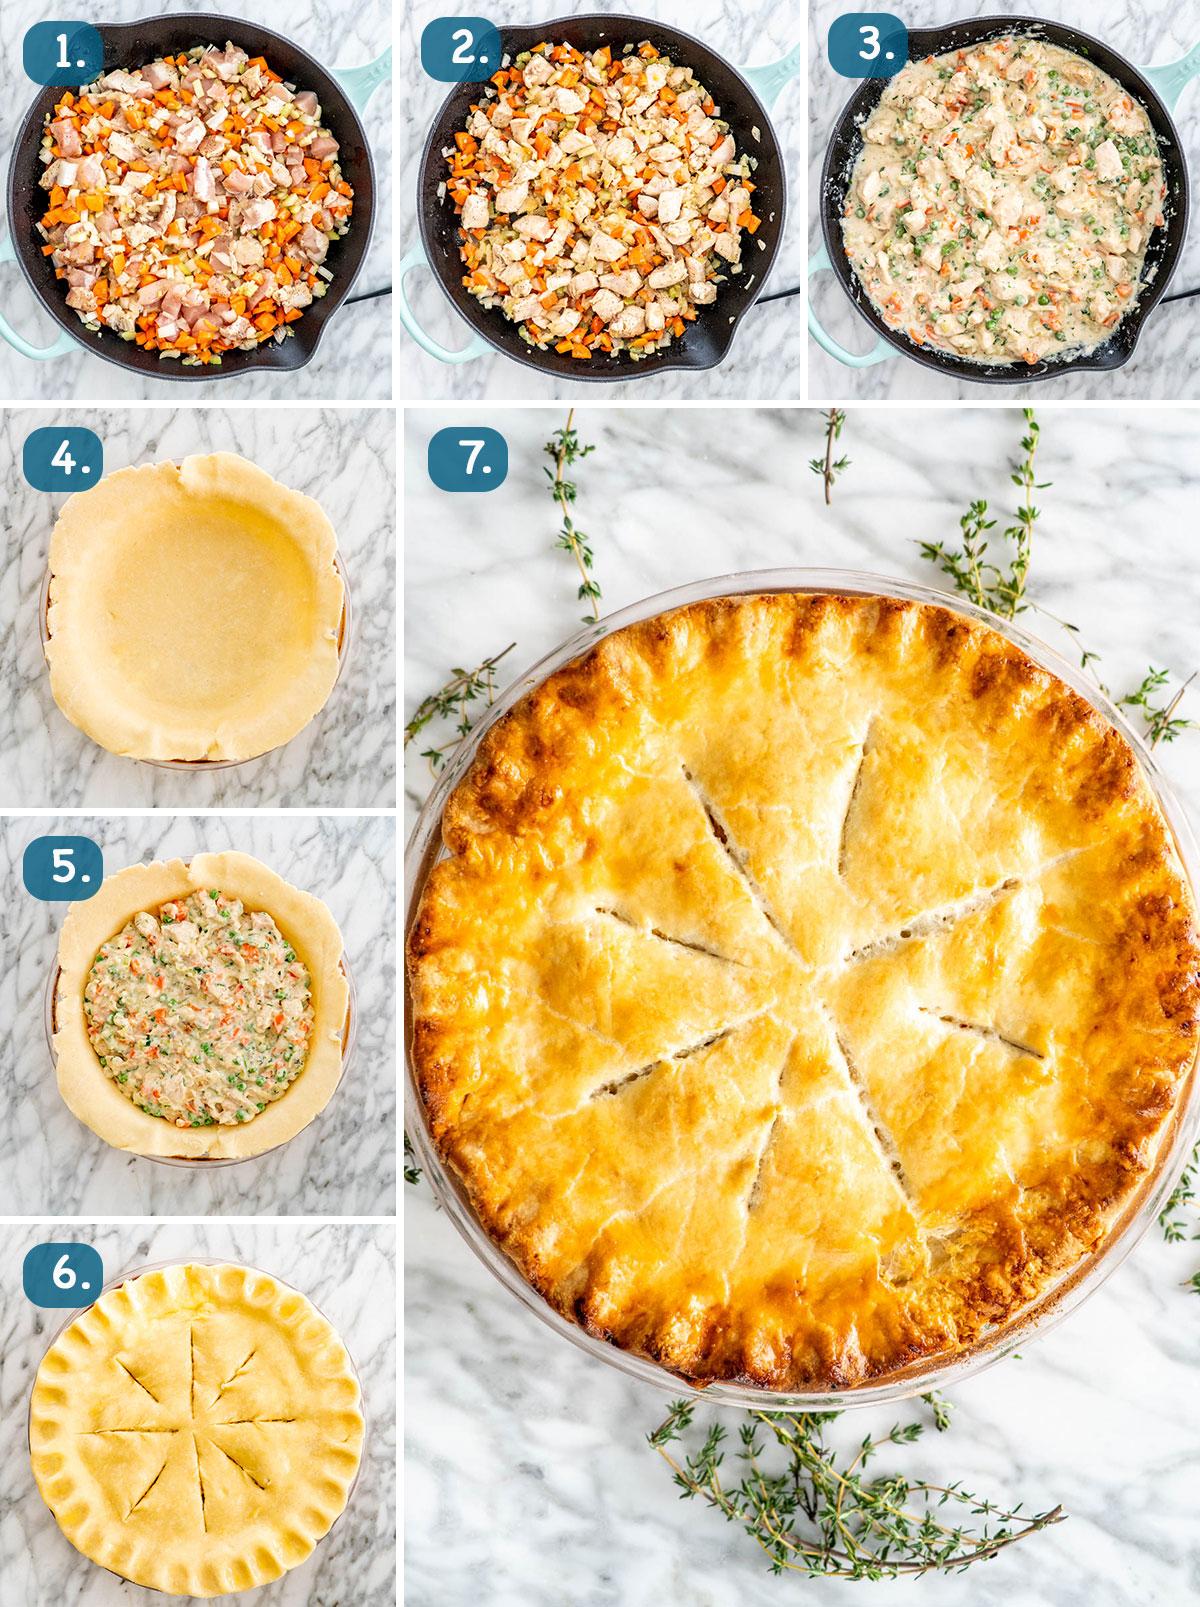 process shots for making chicken pot pie